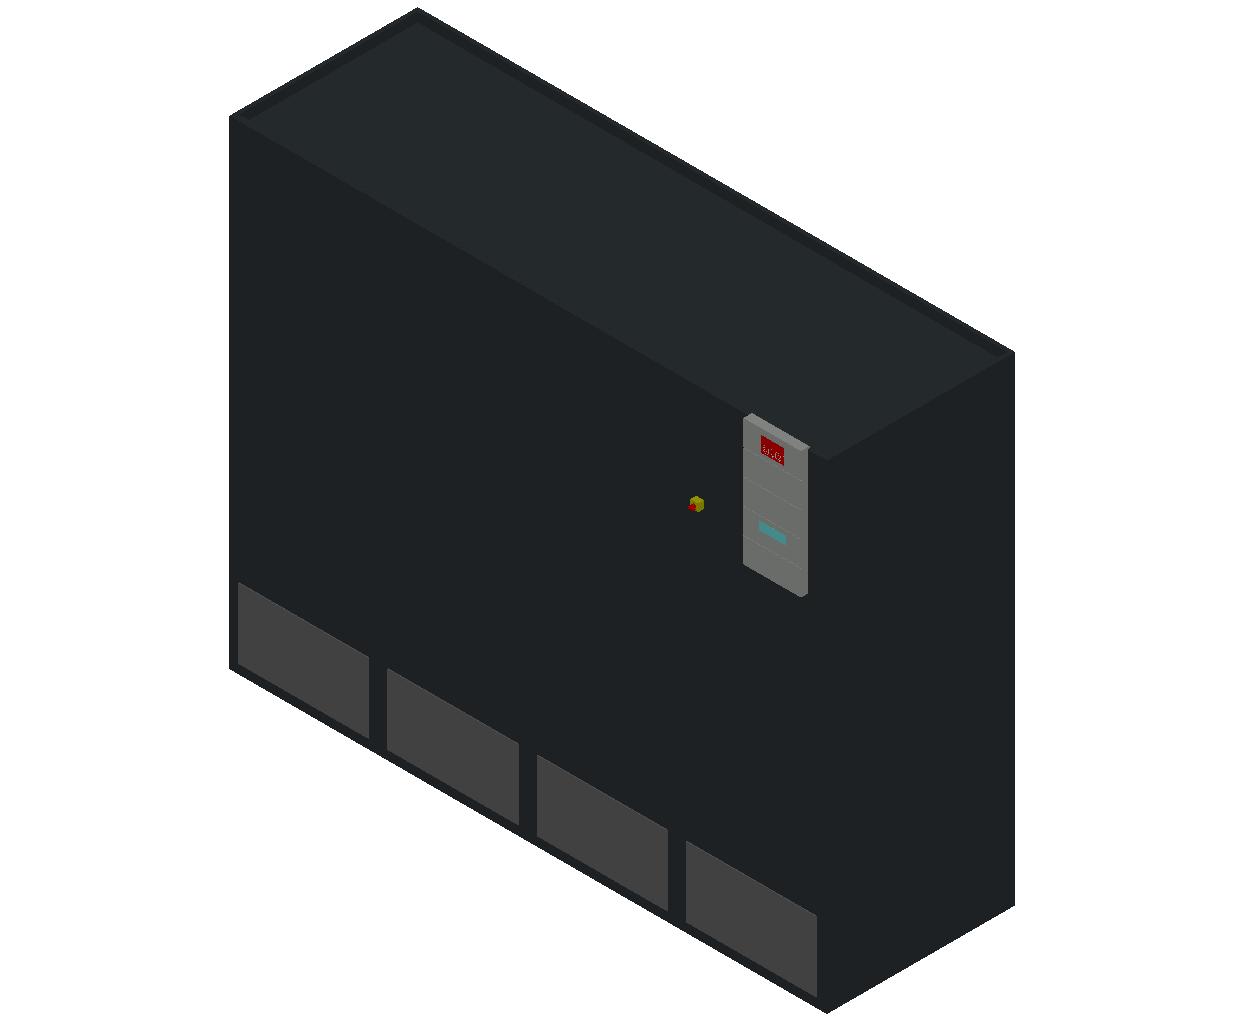 HC_Air Conditioner_Indoor Unit_MEPcontent_STULZ_CyberAir 3PRO_ALR_Dual Circuit GES_ALR_1302_GES_INT-EN.dwg